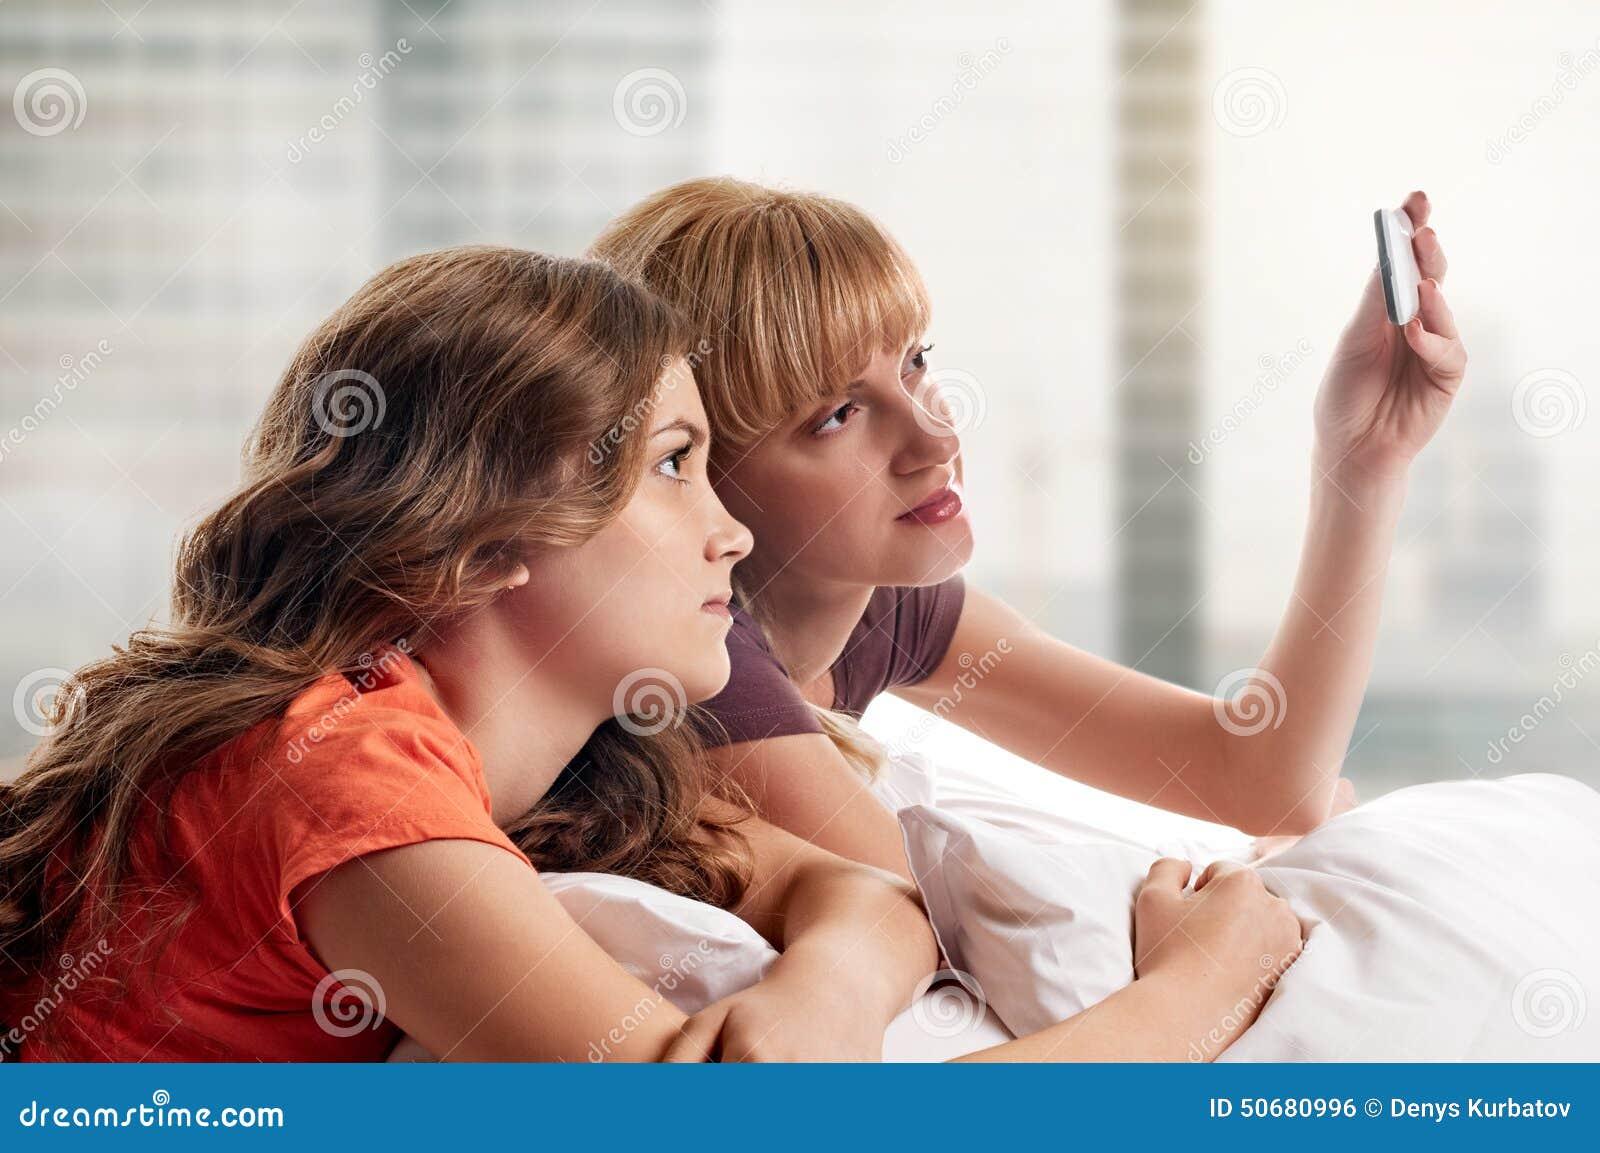 Download 做selfie 库存照片. 图片 包括有 友谊, 滑稽, 女孩, 豪华, 朋友, 女性, 查找, 关系, beautifuler - 50680996